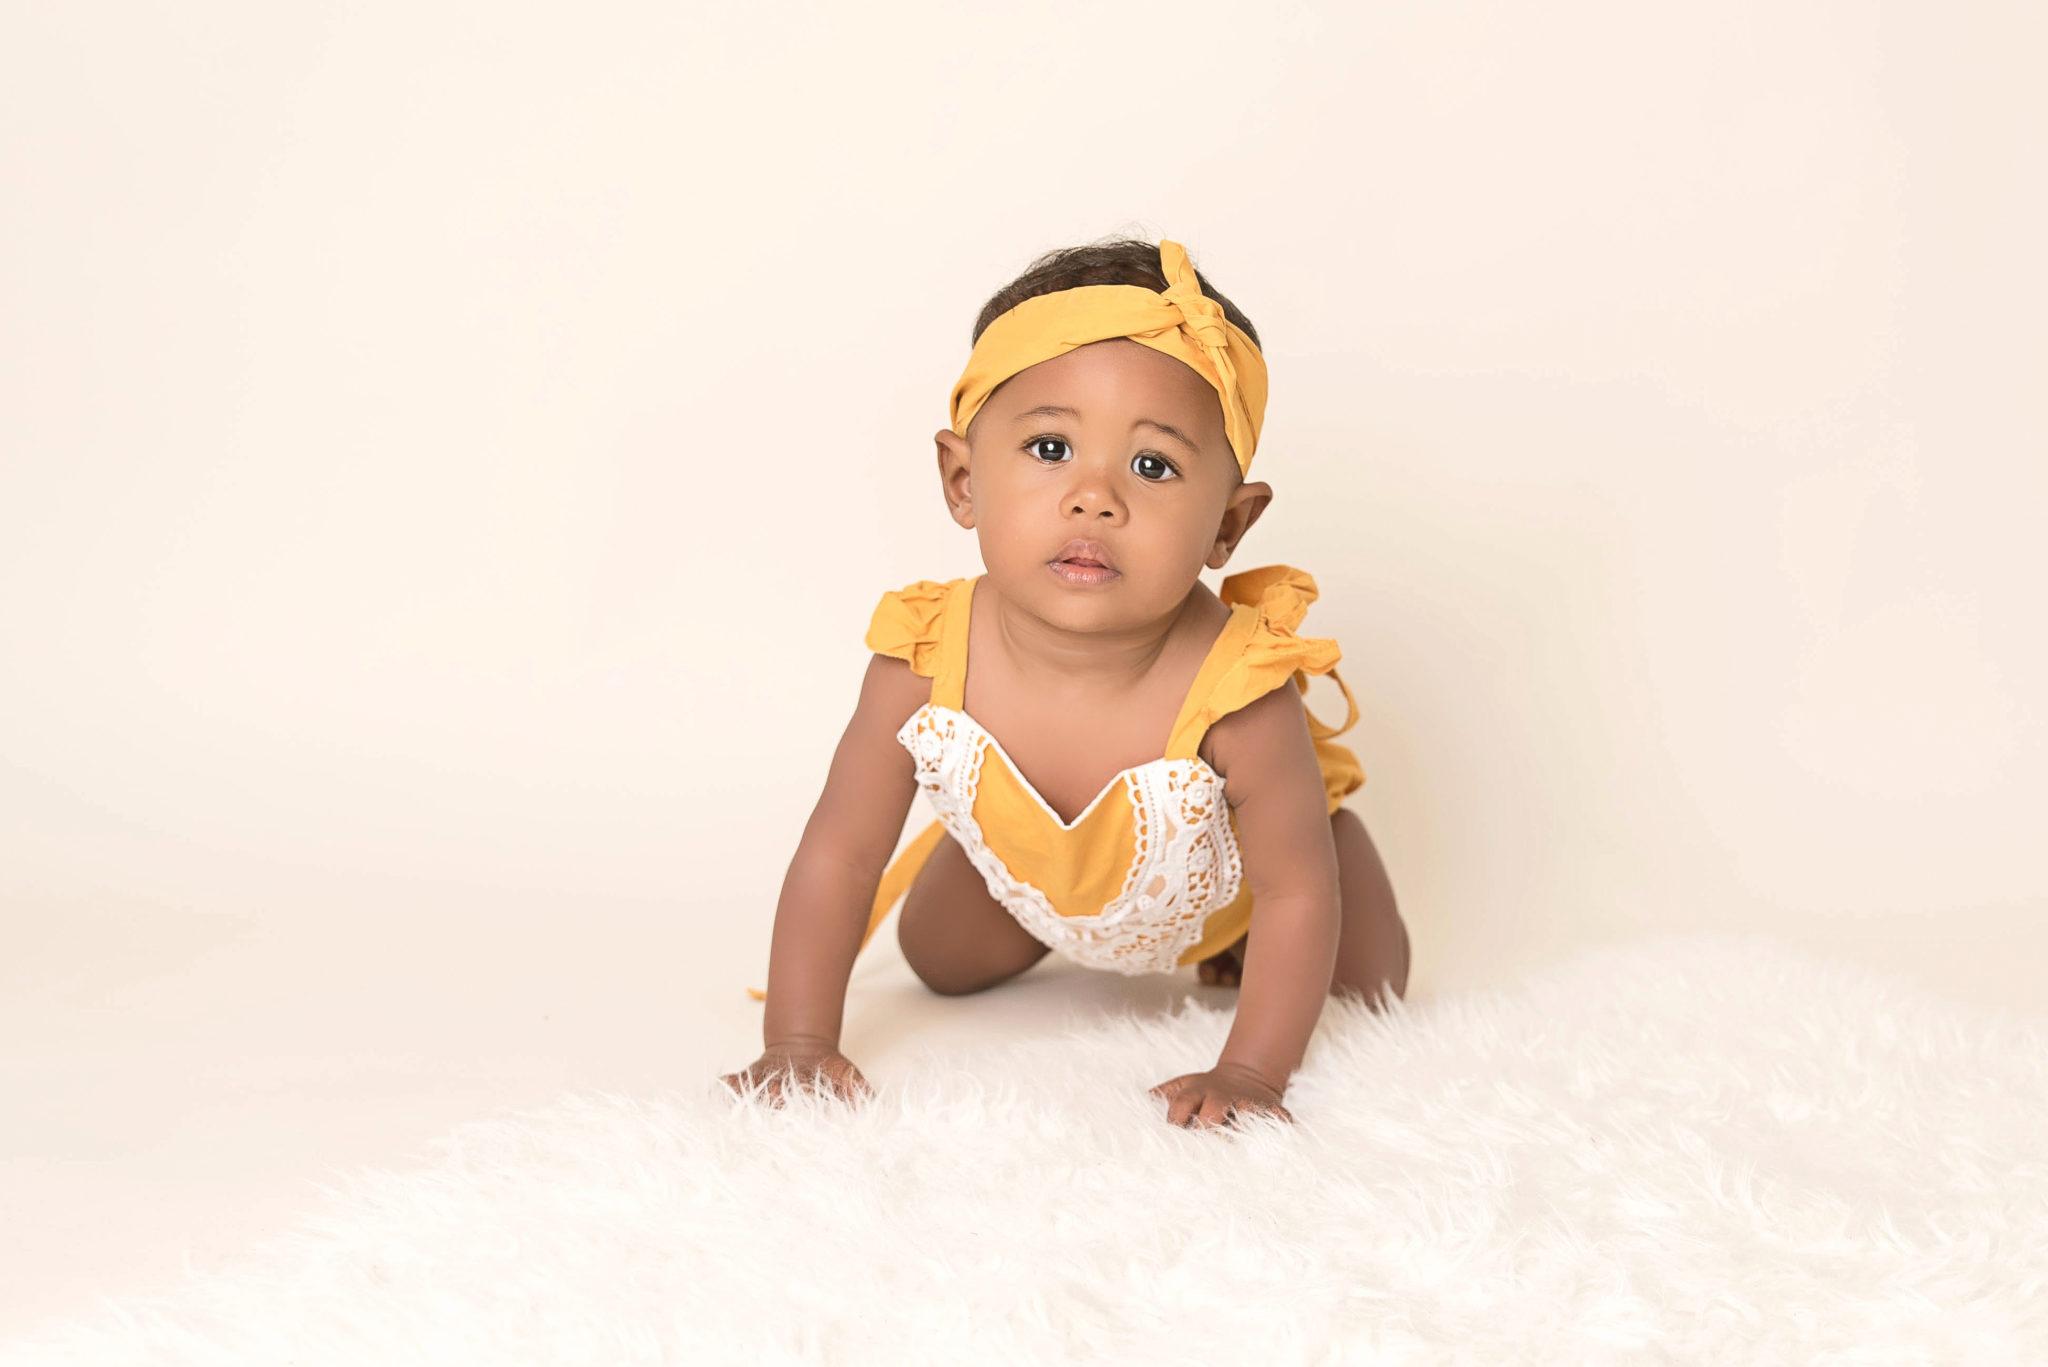 Photographe bébé oise seine et marne val d'oise ainse (8)